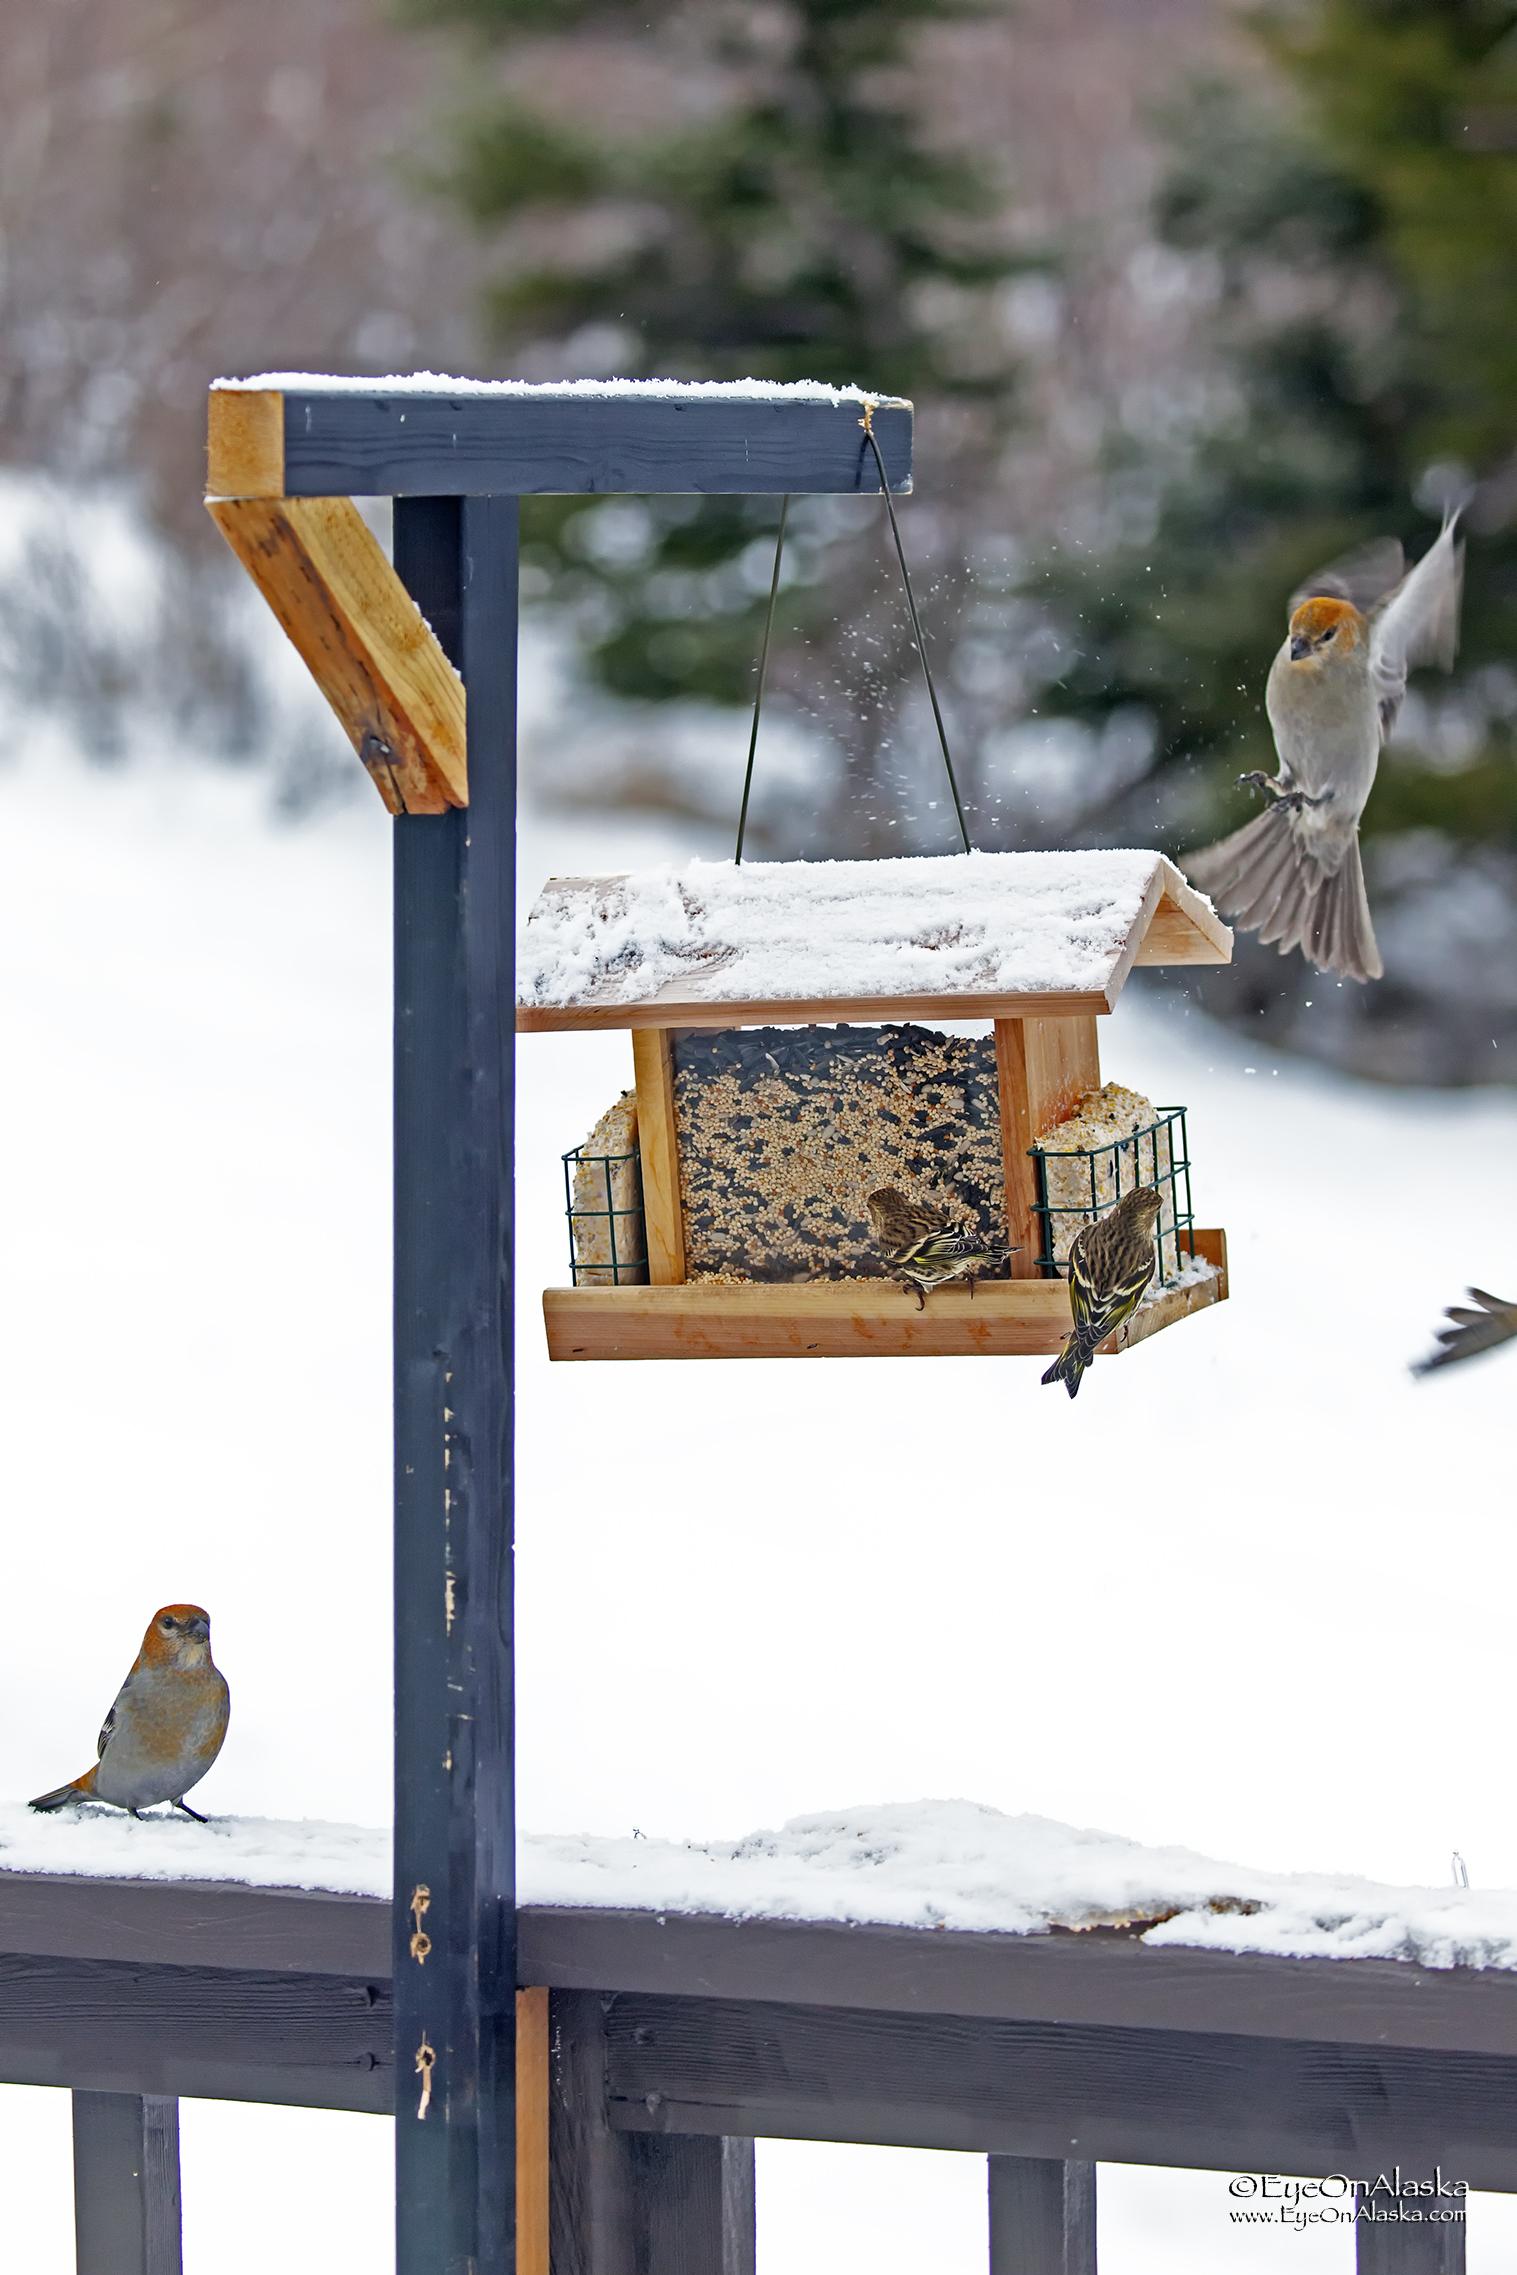 The little birds are Pine Siskin's.